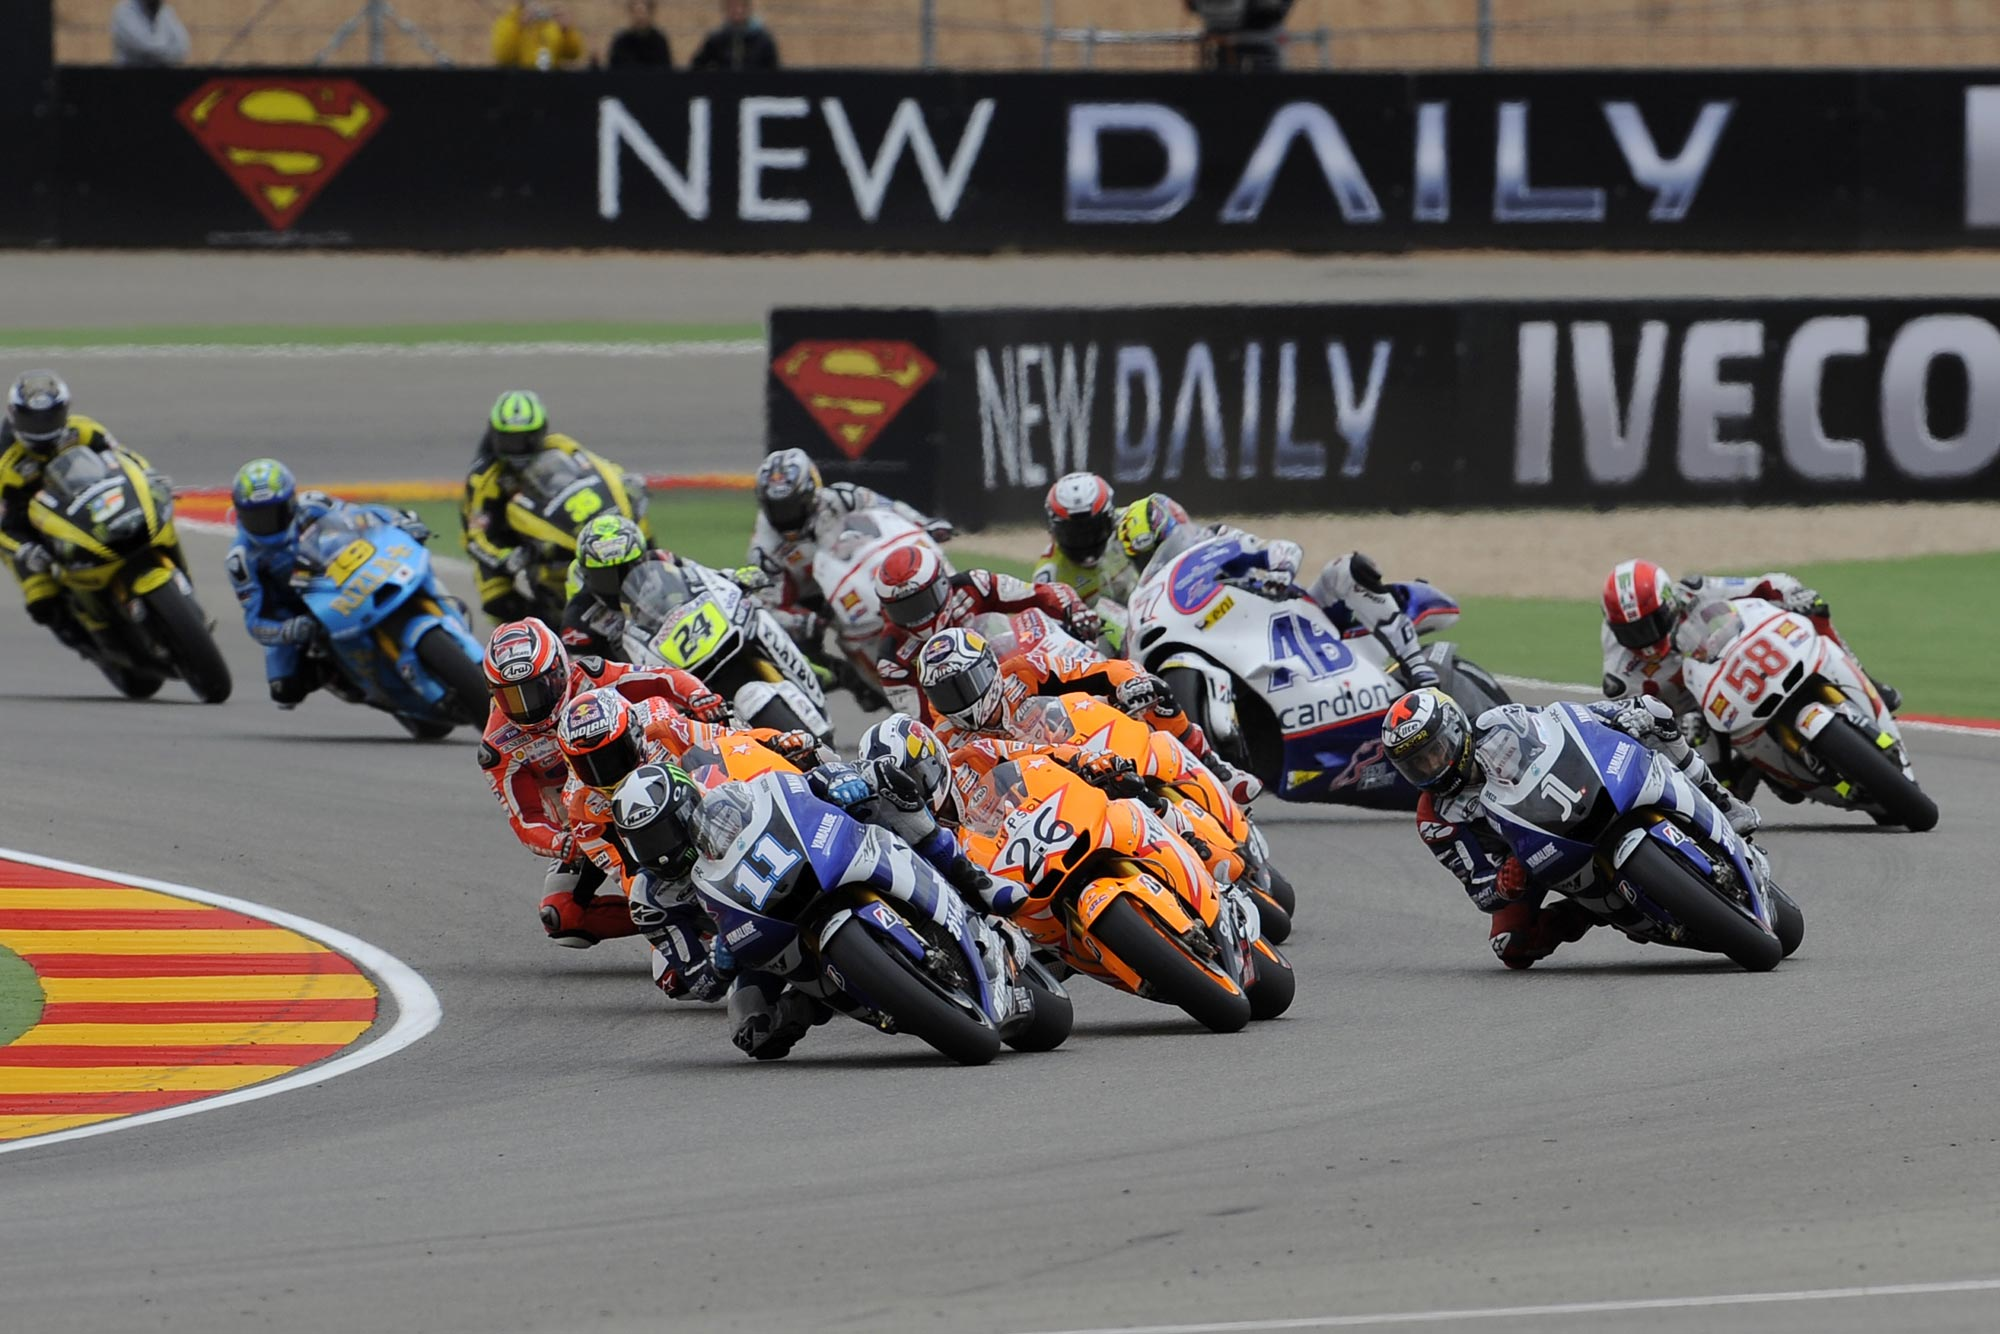 (MOTOGP) Aragon - Page 4 MotoGP-Aragon-GP-start